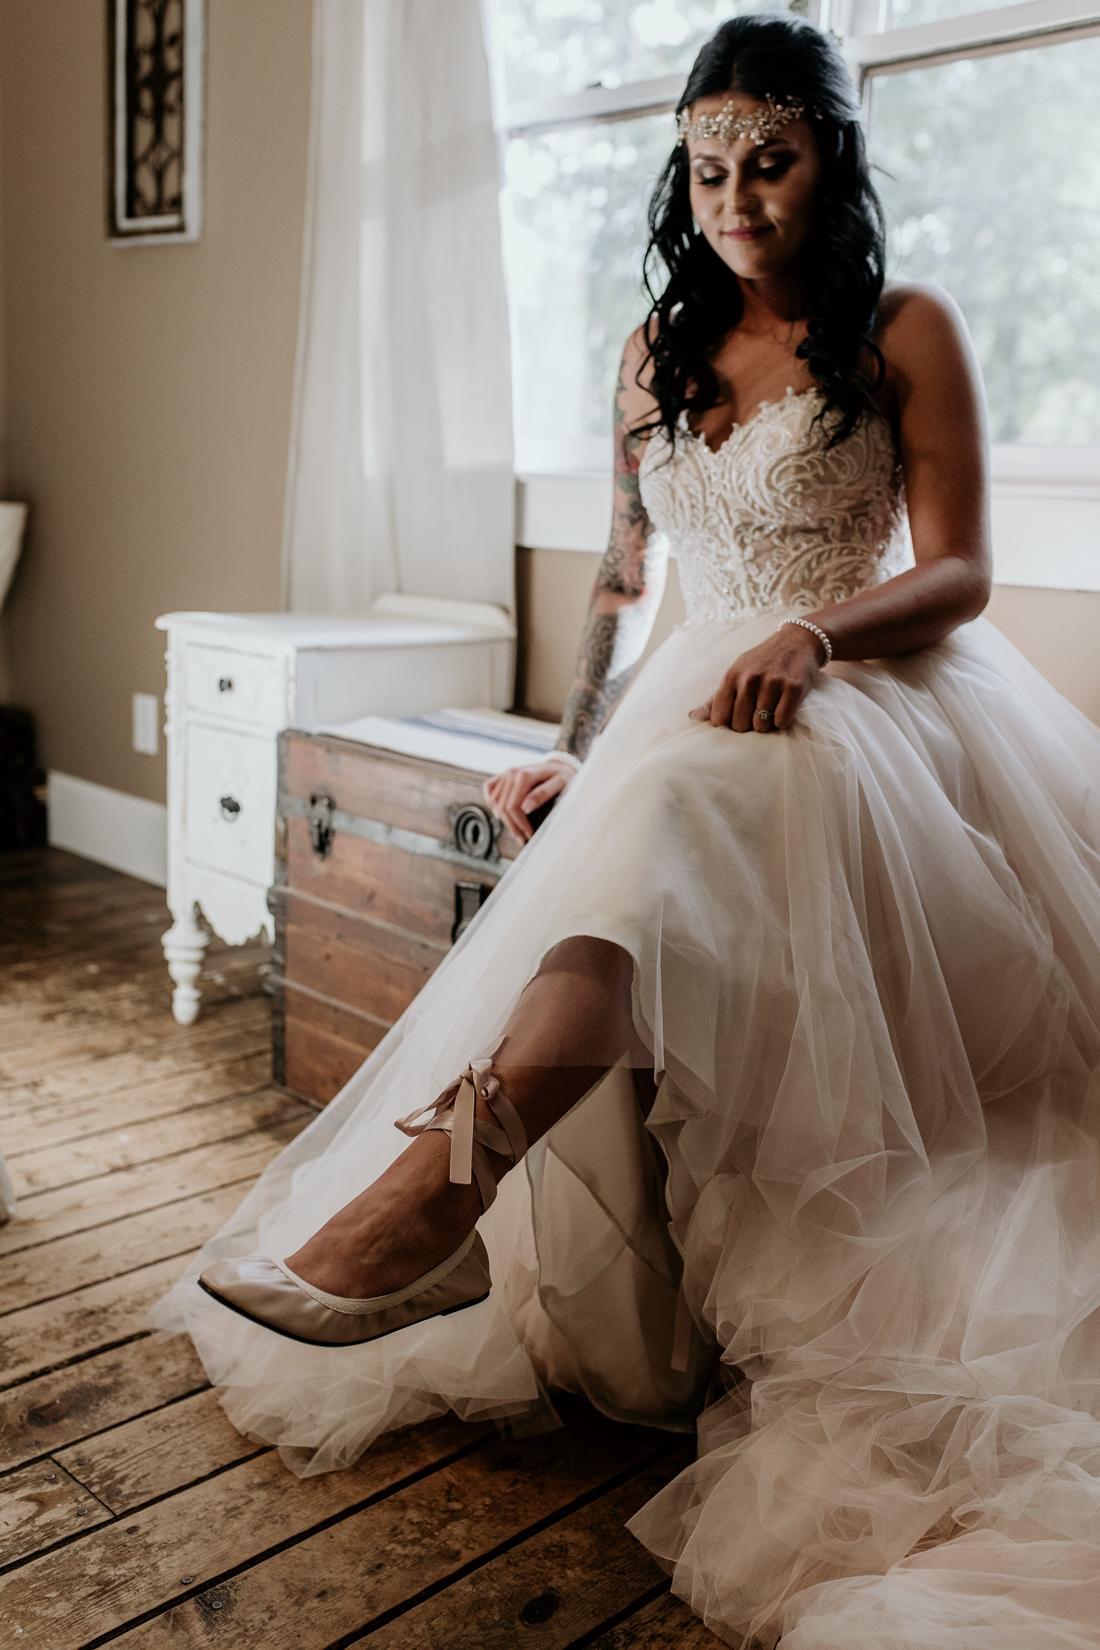 olivia_zay_wedding_09_2018-8675.jpg